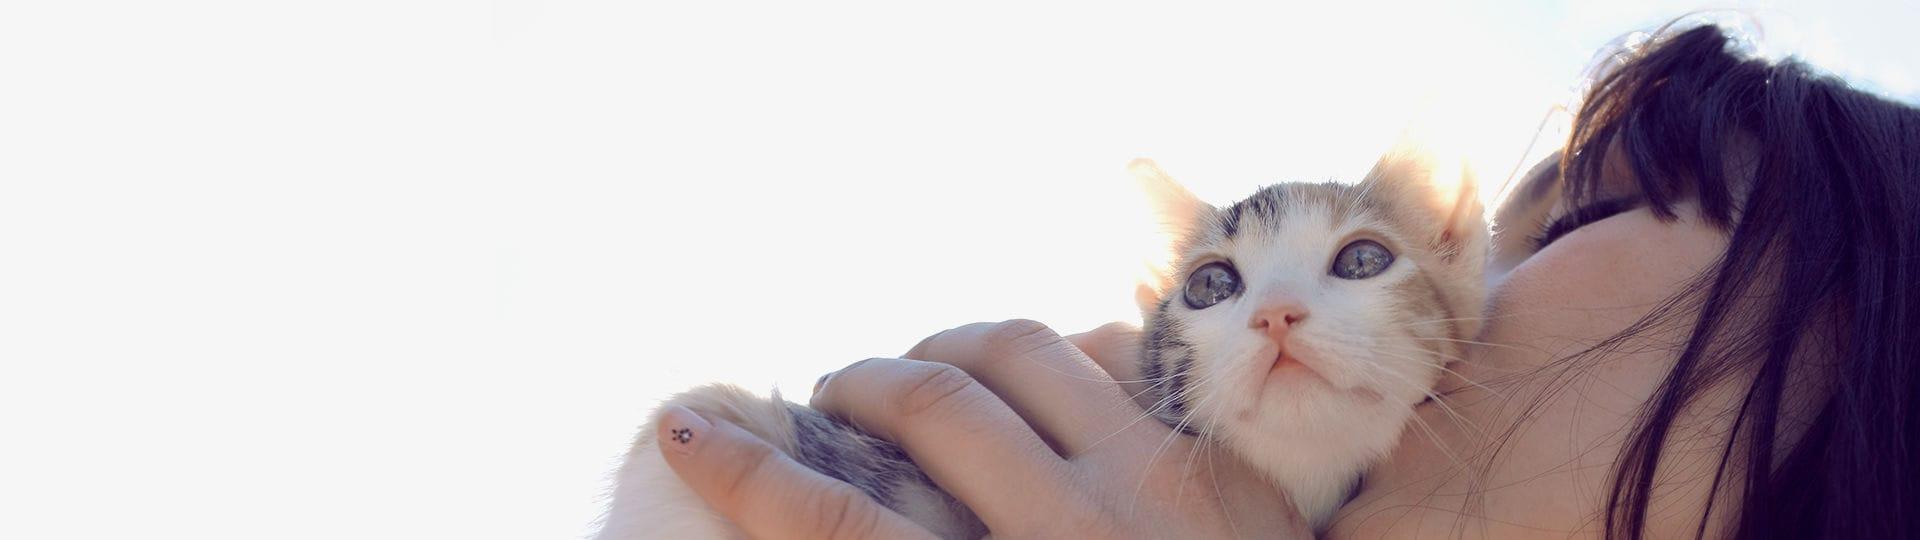 Les vétérinaires recommandent Feliway